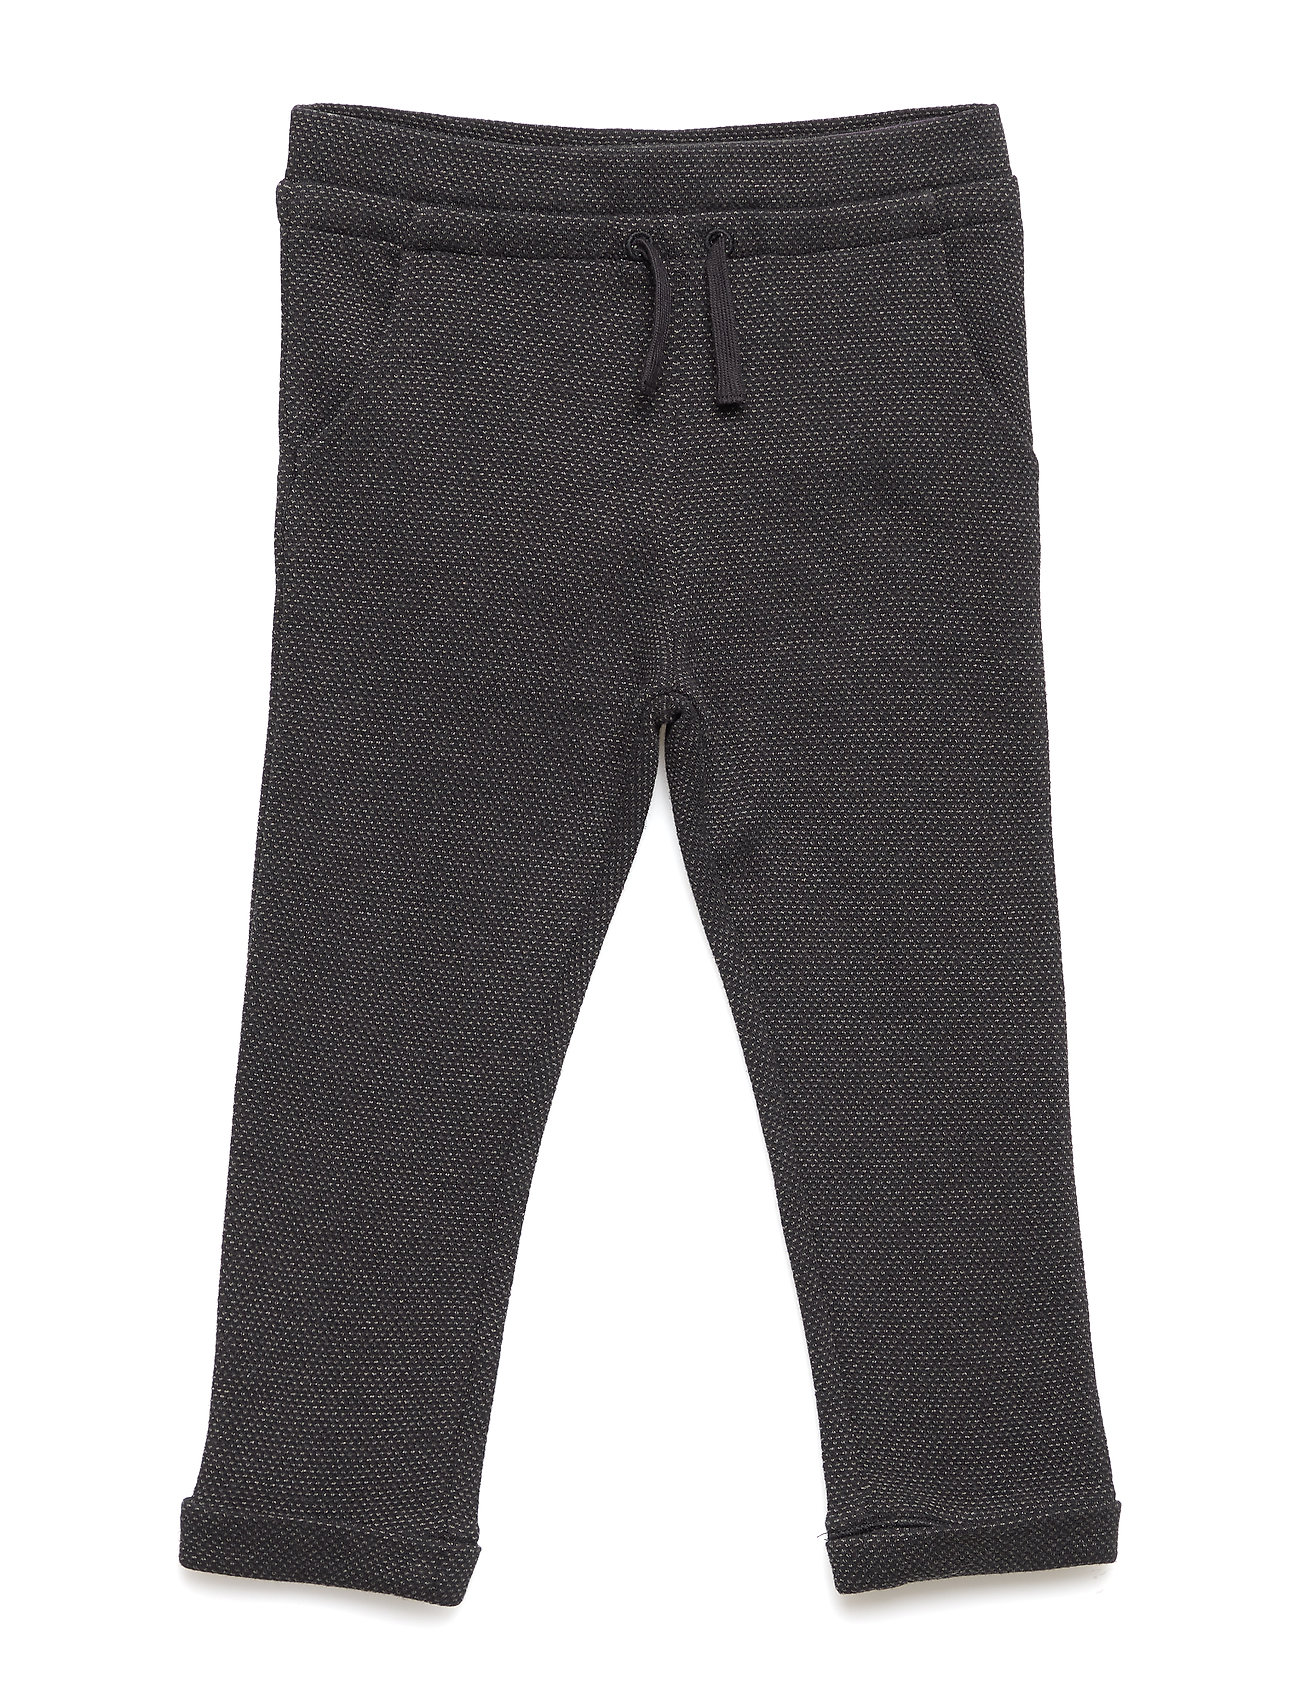 Polarn O. Pyret Trousers Swettis Preschool